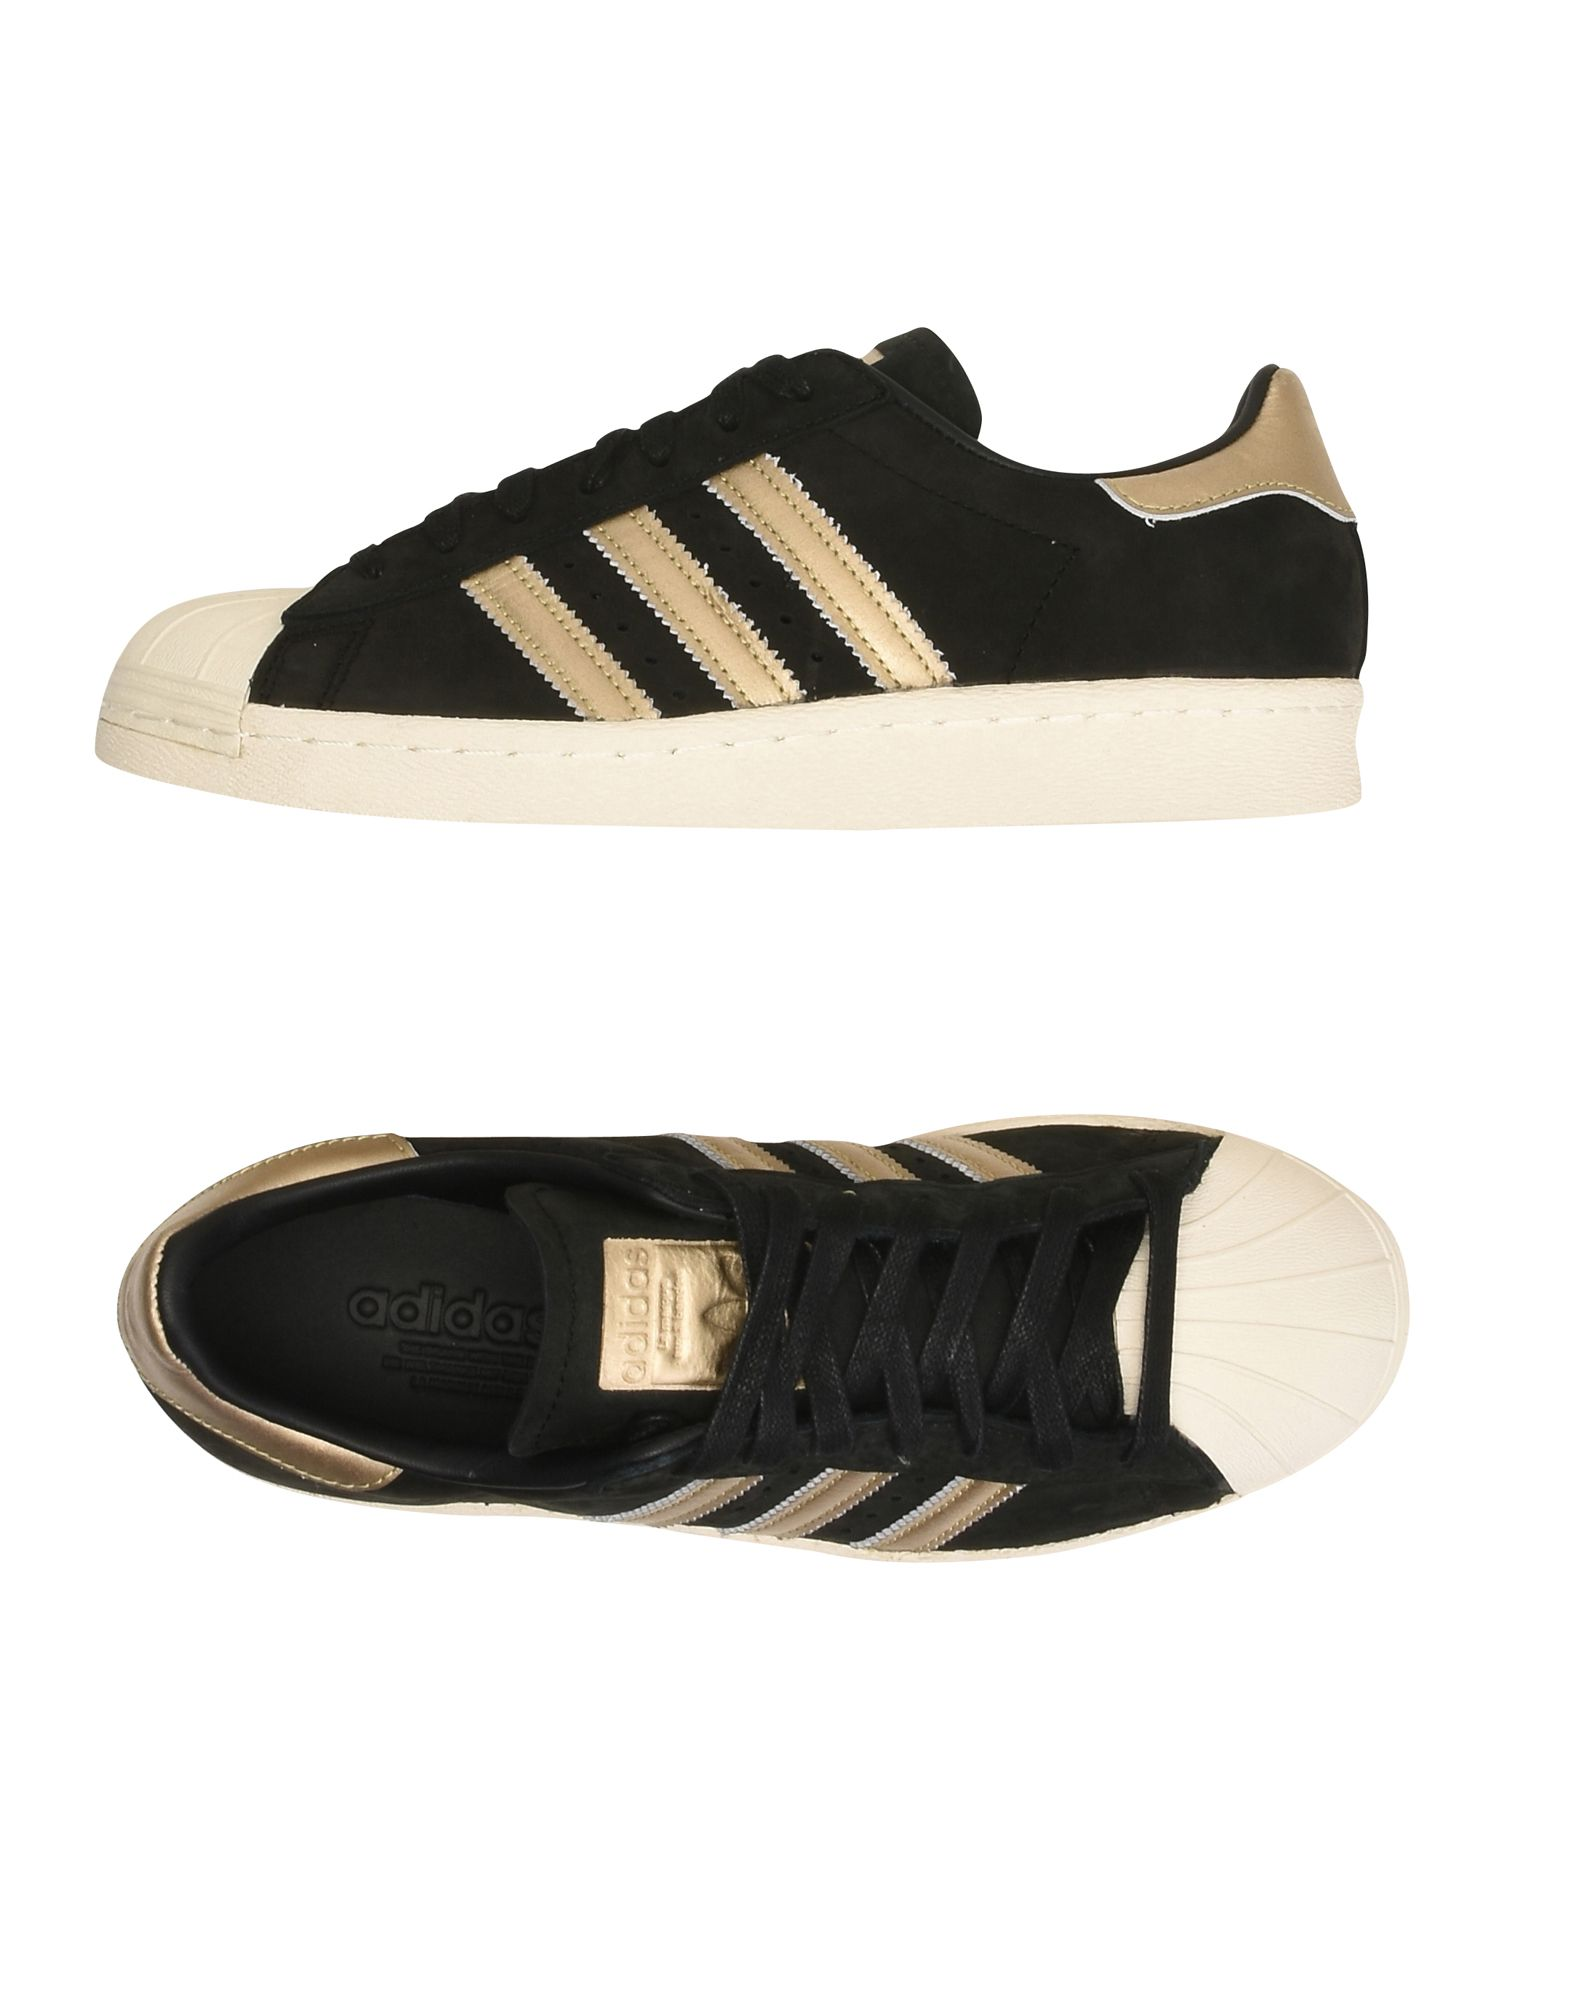 Sneakers Adidas Originals Superstar 80S 999 W - Donna - Acquista online su